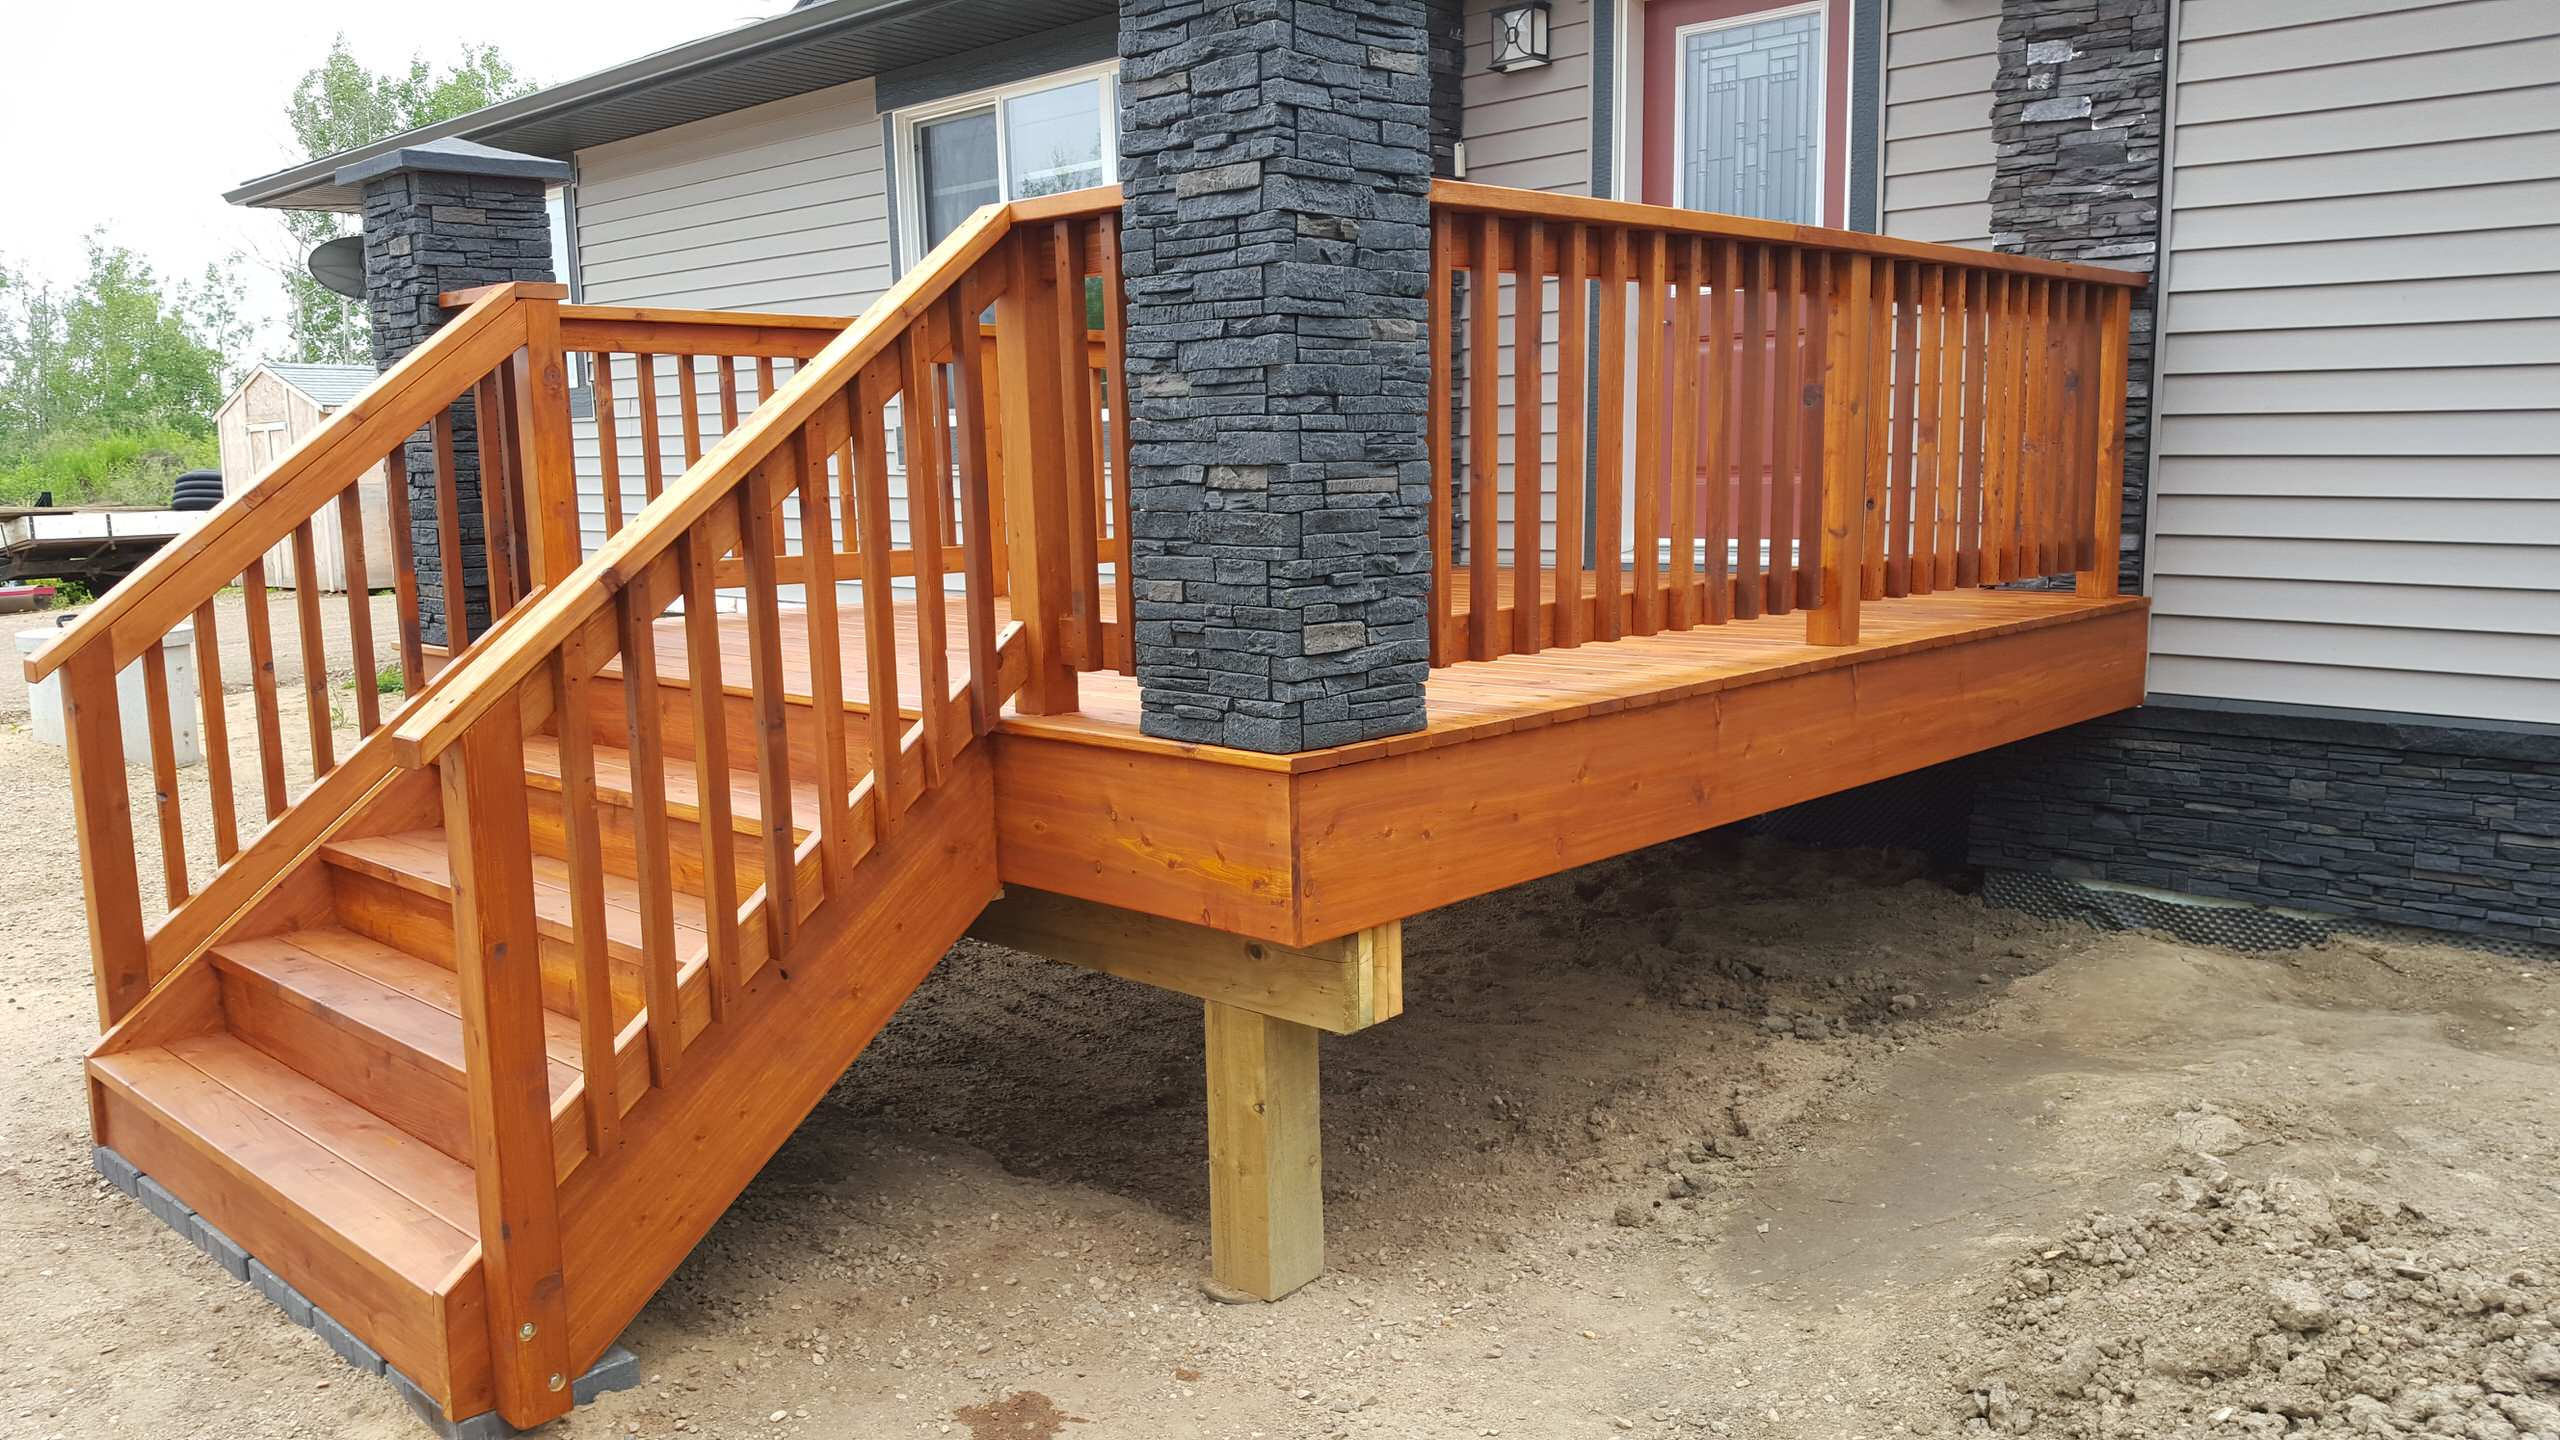 Cedar Deck Staining with Sansin, Redwater